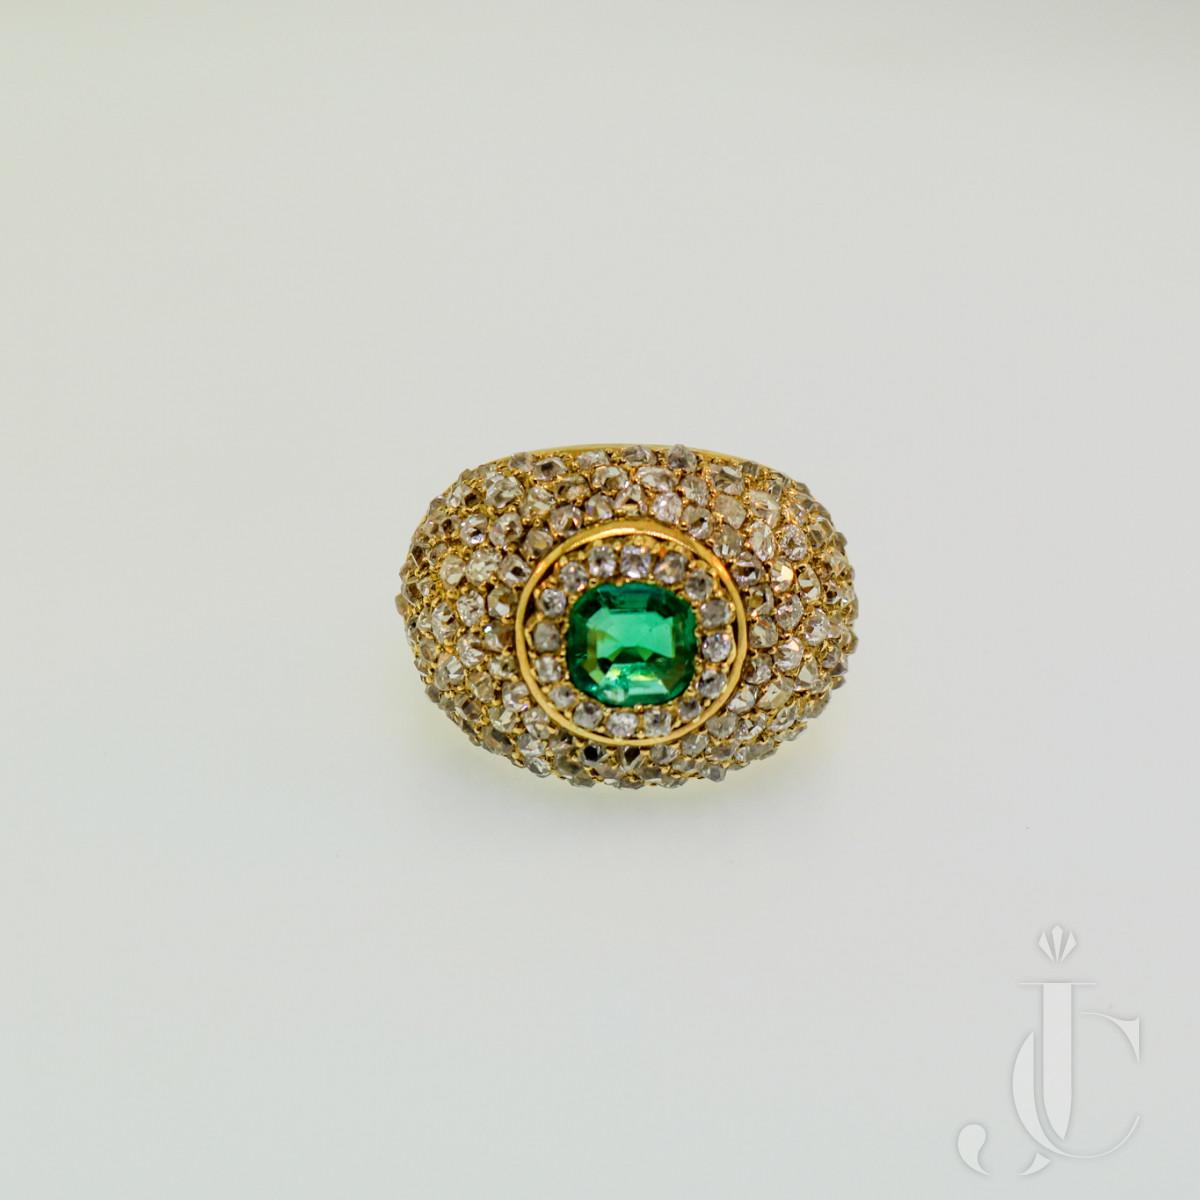 Boivin, Emerald & Diamond Ring